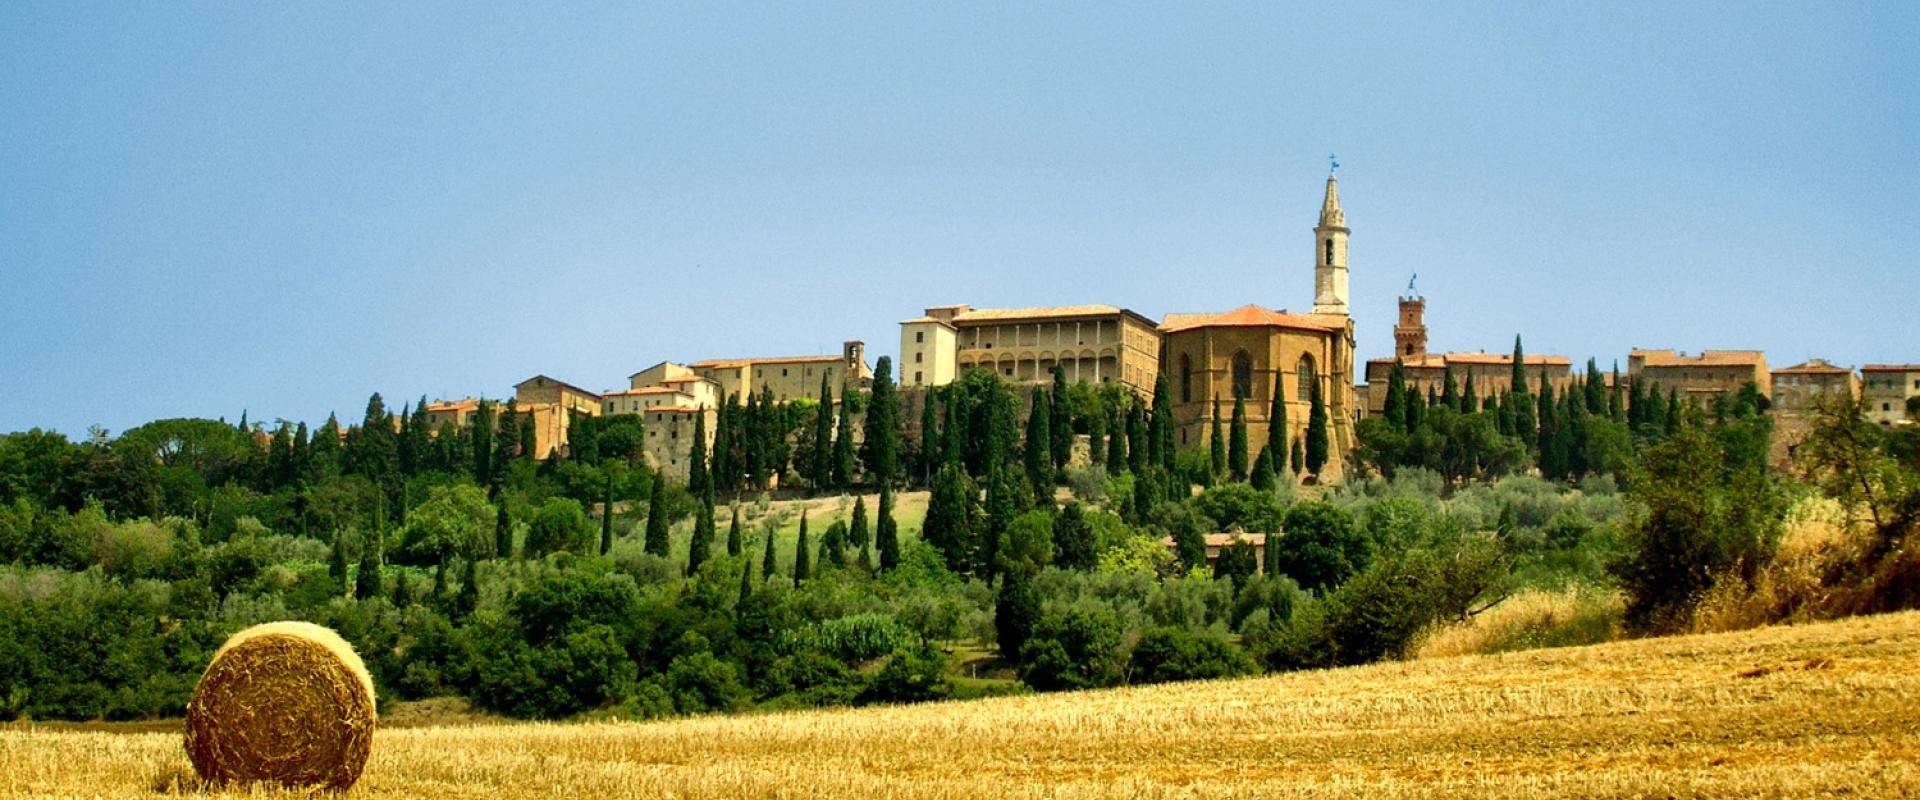 Tour Central Italy: Tuscany and Trasimeno Lake